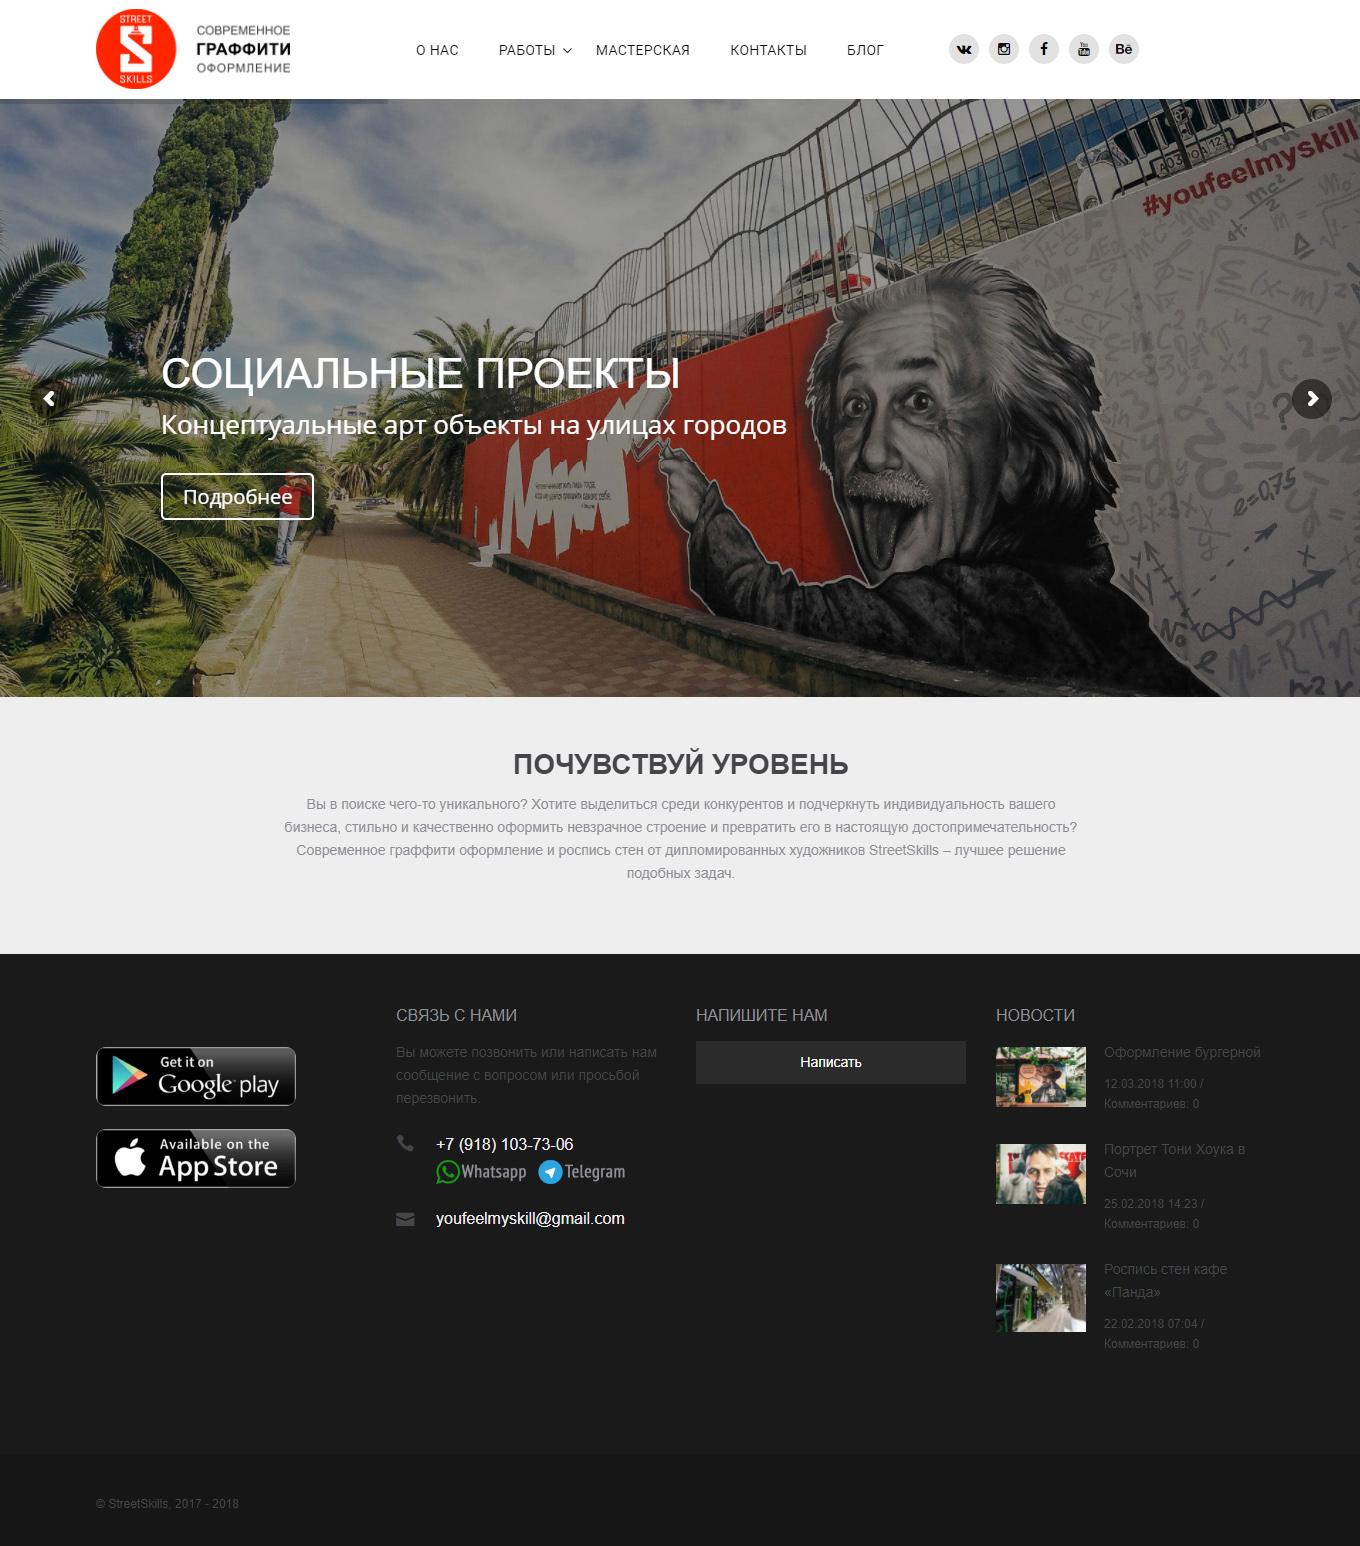 https://28-digital.ru/project/youfeelmyskill/